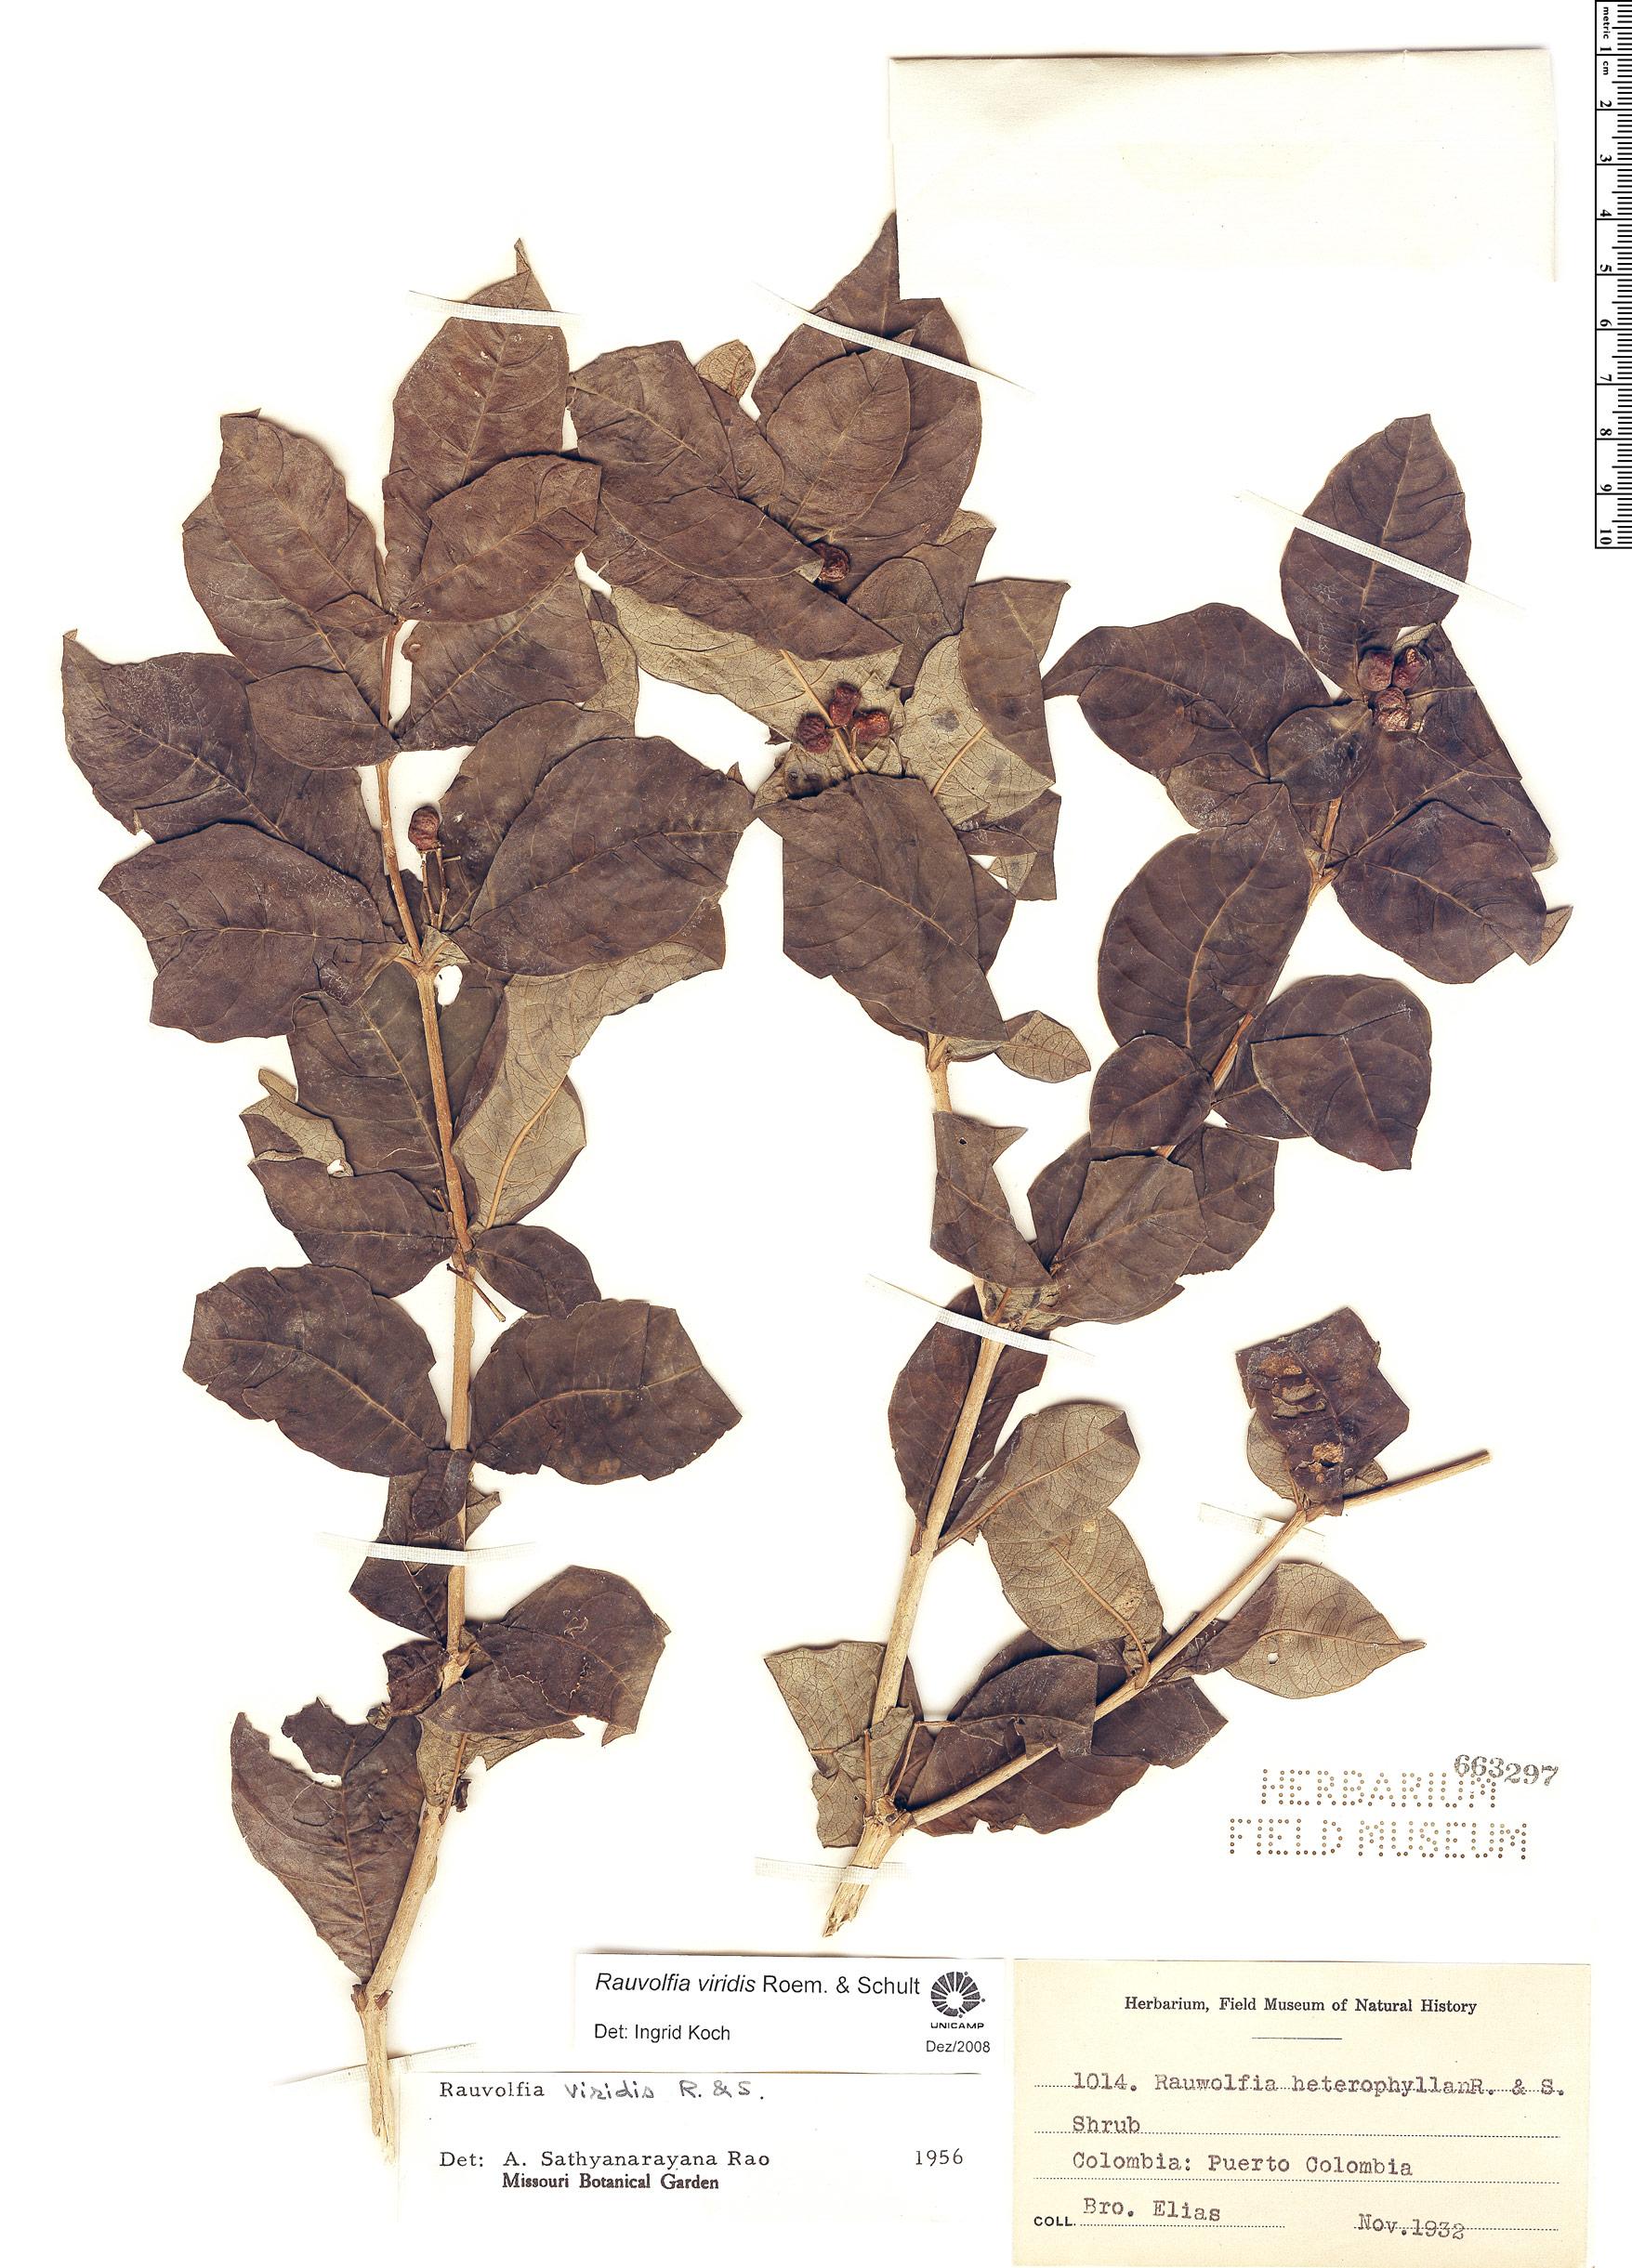 Specimen: Rauvolfia viridis